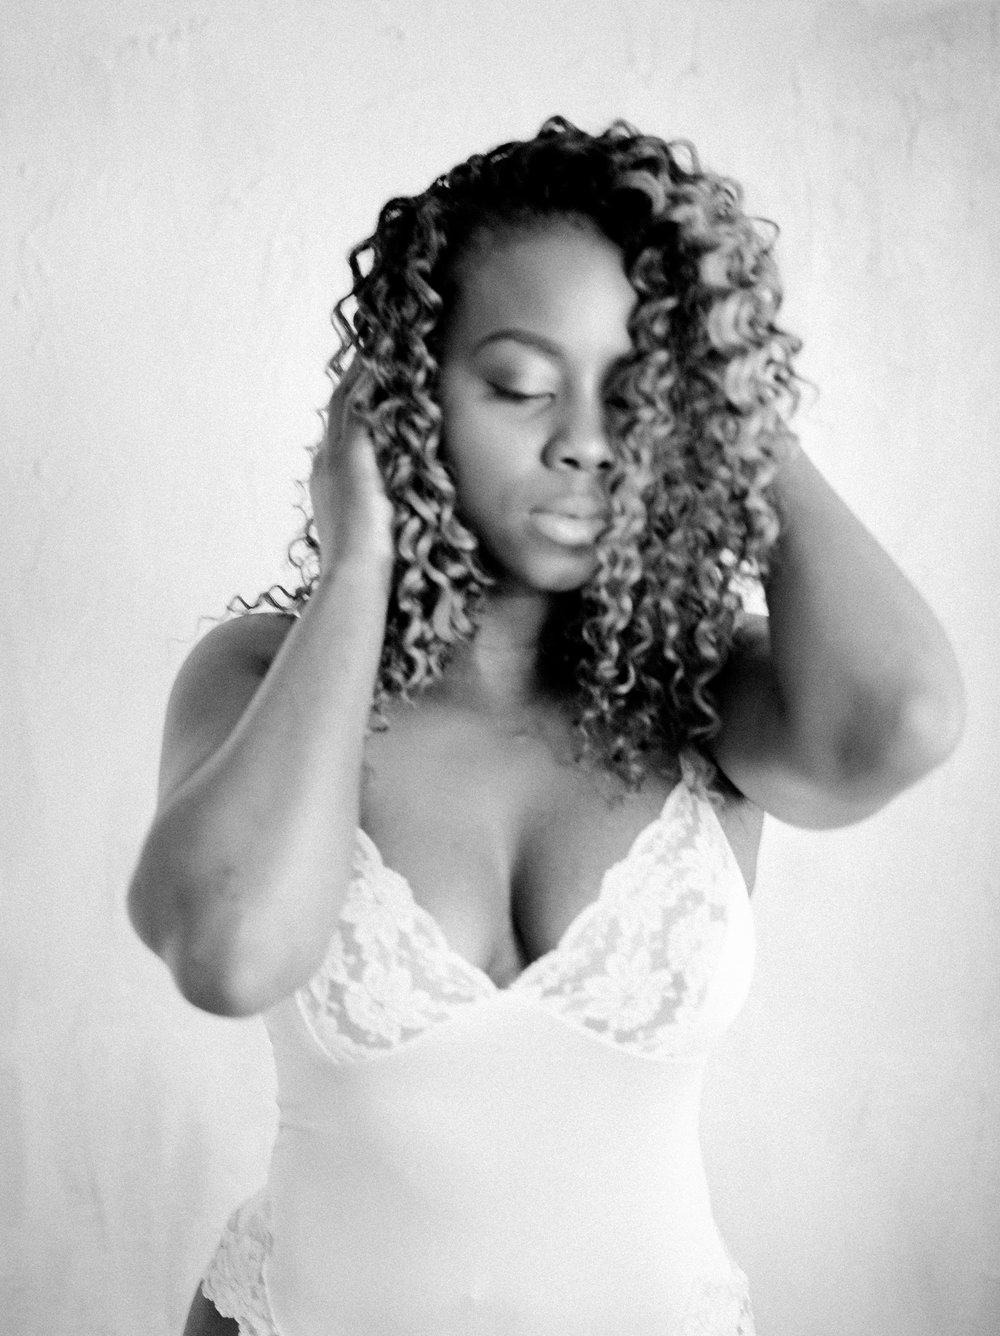 boudoir photography West Palm Beach Boudoir Denice Lachapelle Photography